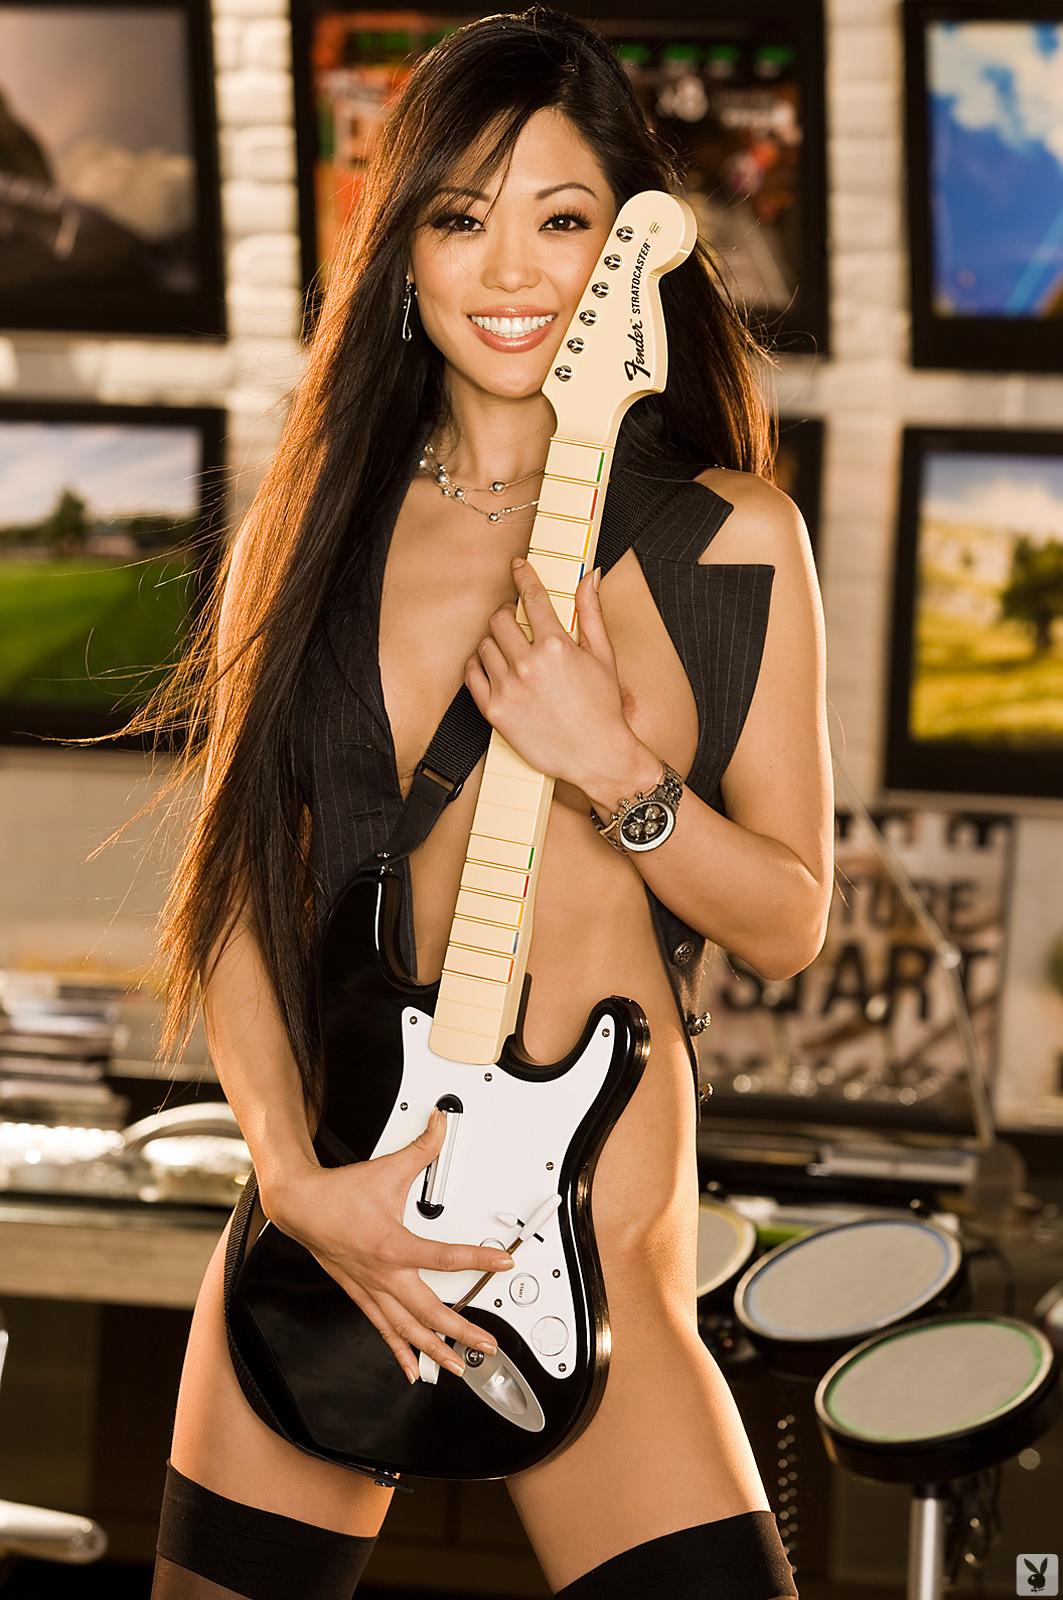 grace-kim-guitar-stockings-naked-asian-playboy-18